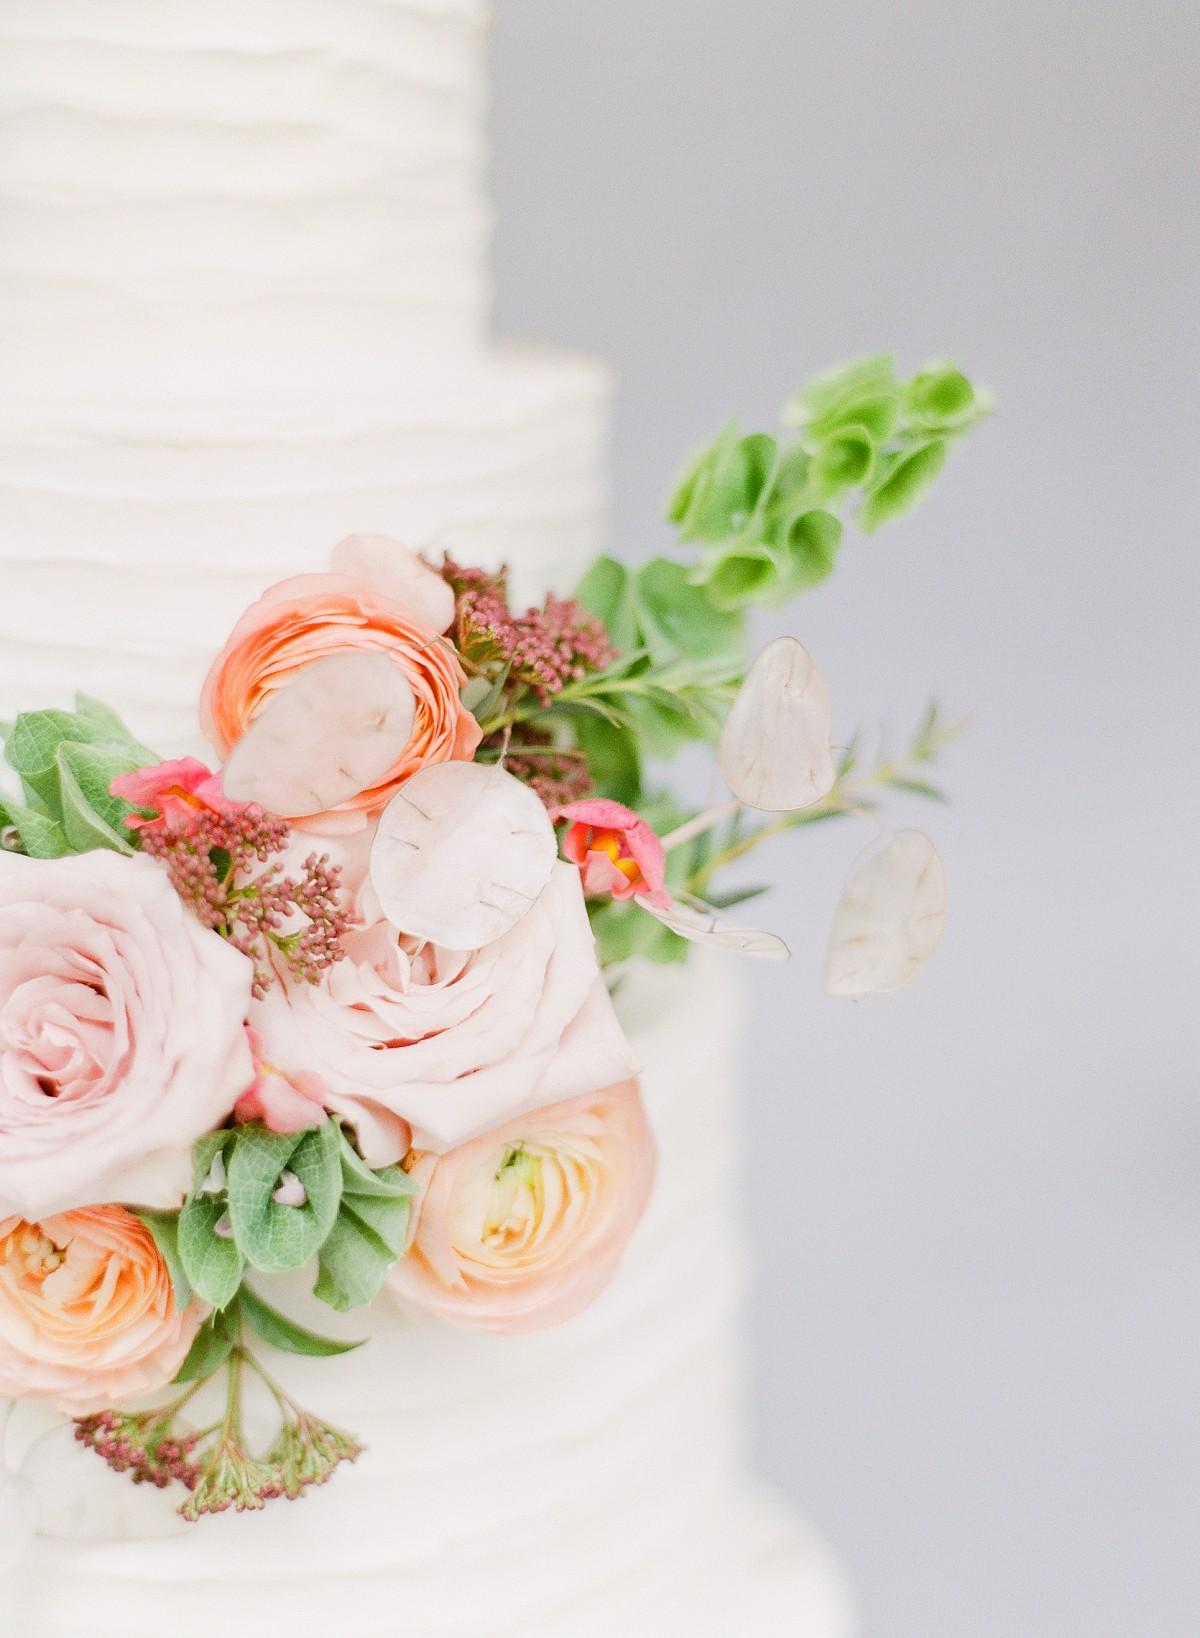 wedding cake ideas - rustic